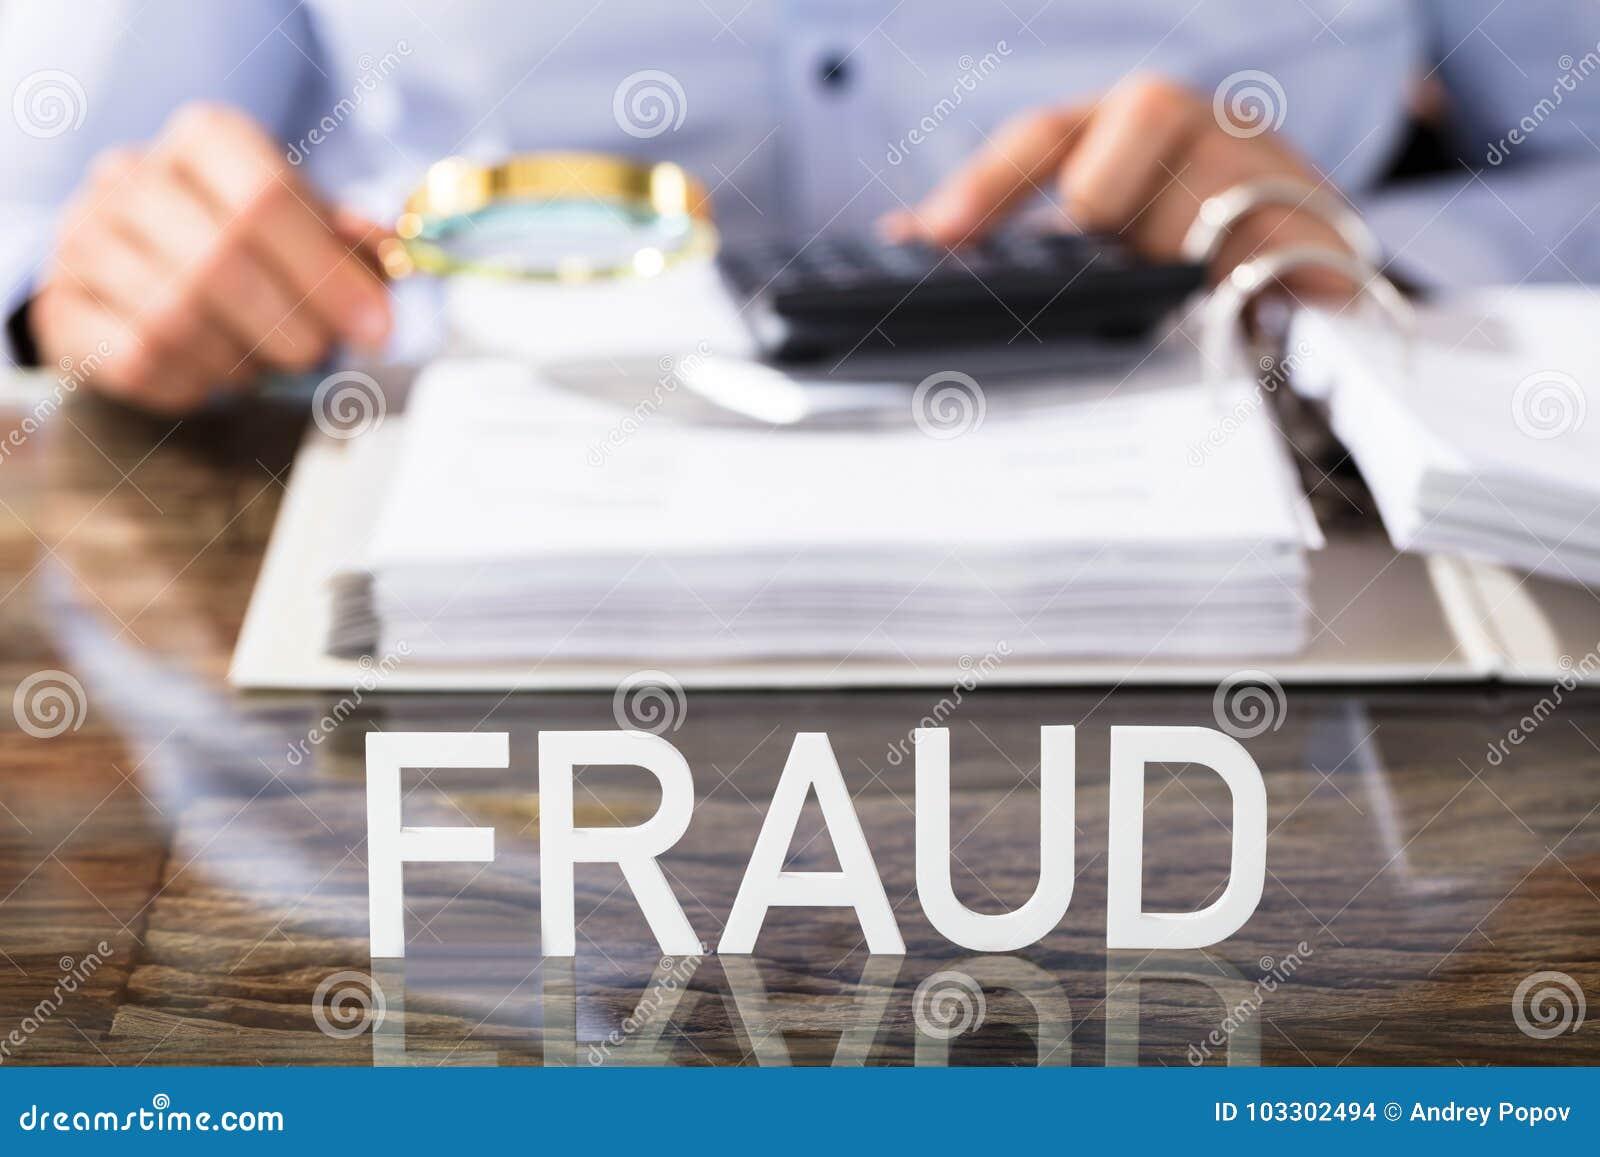 Texto da fraude na mesa de escritório